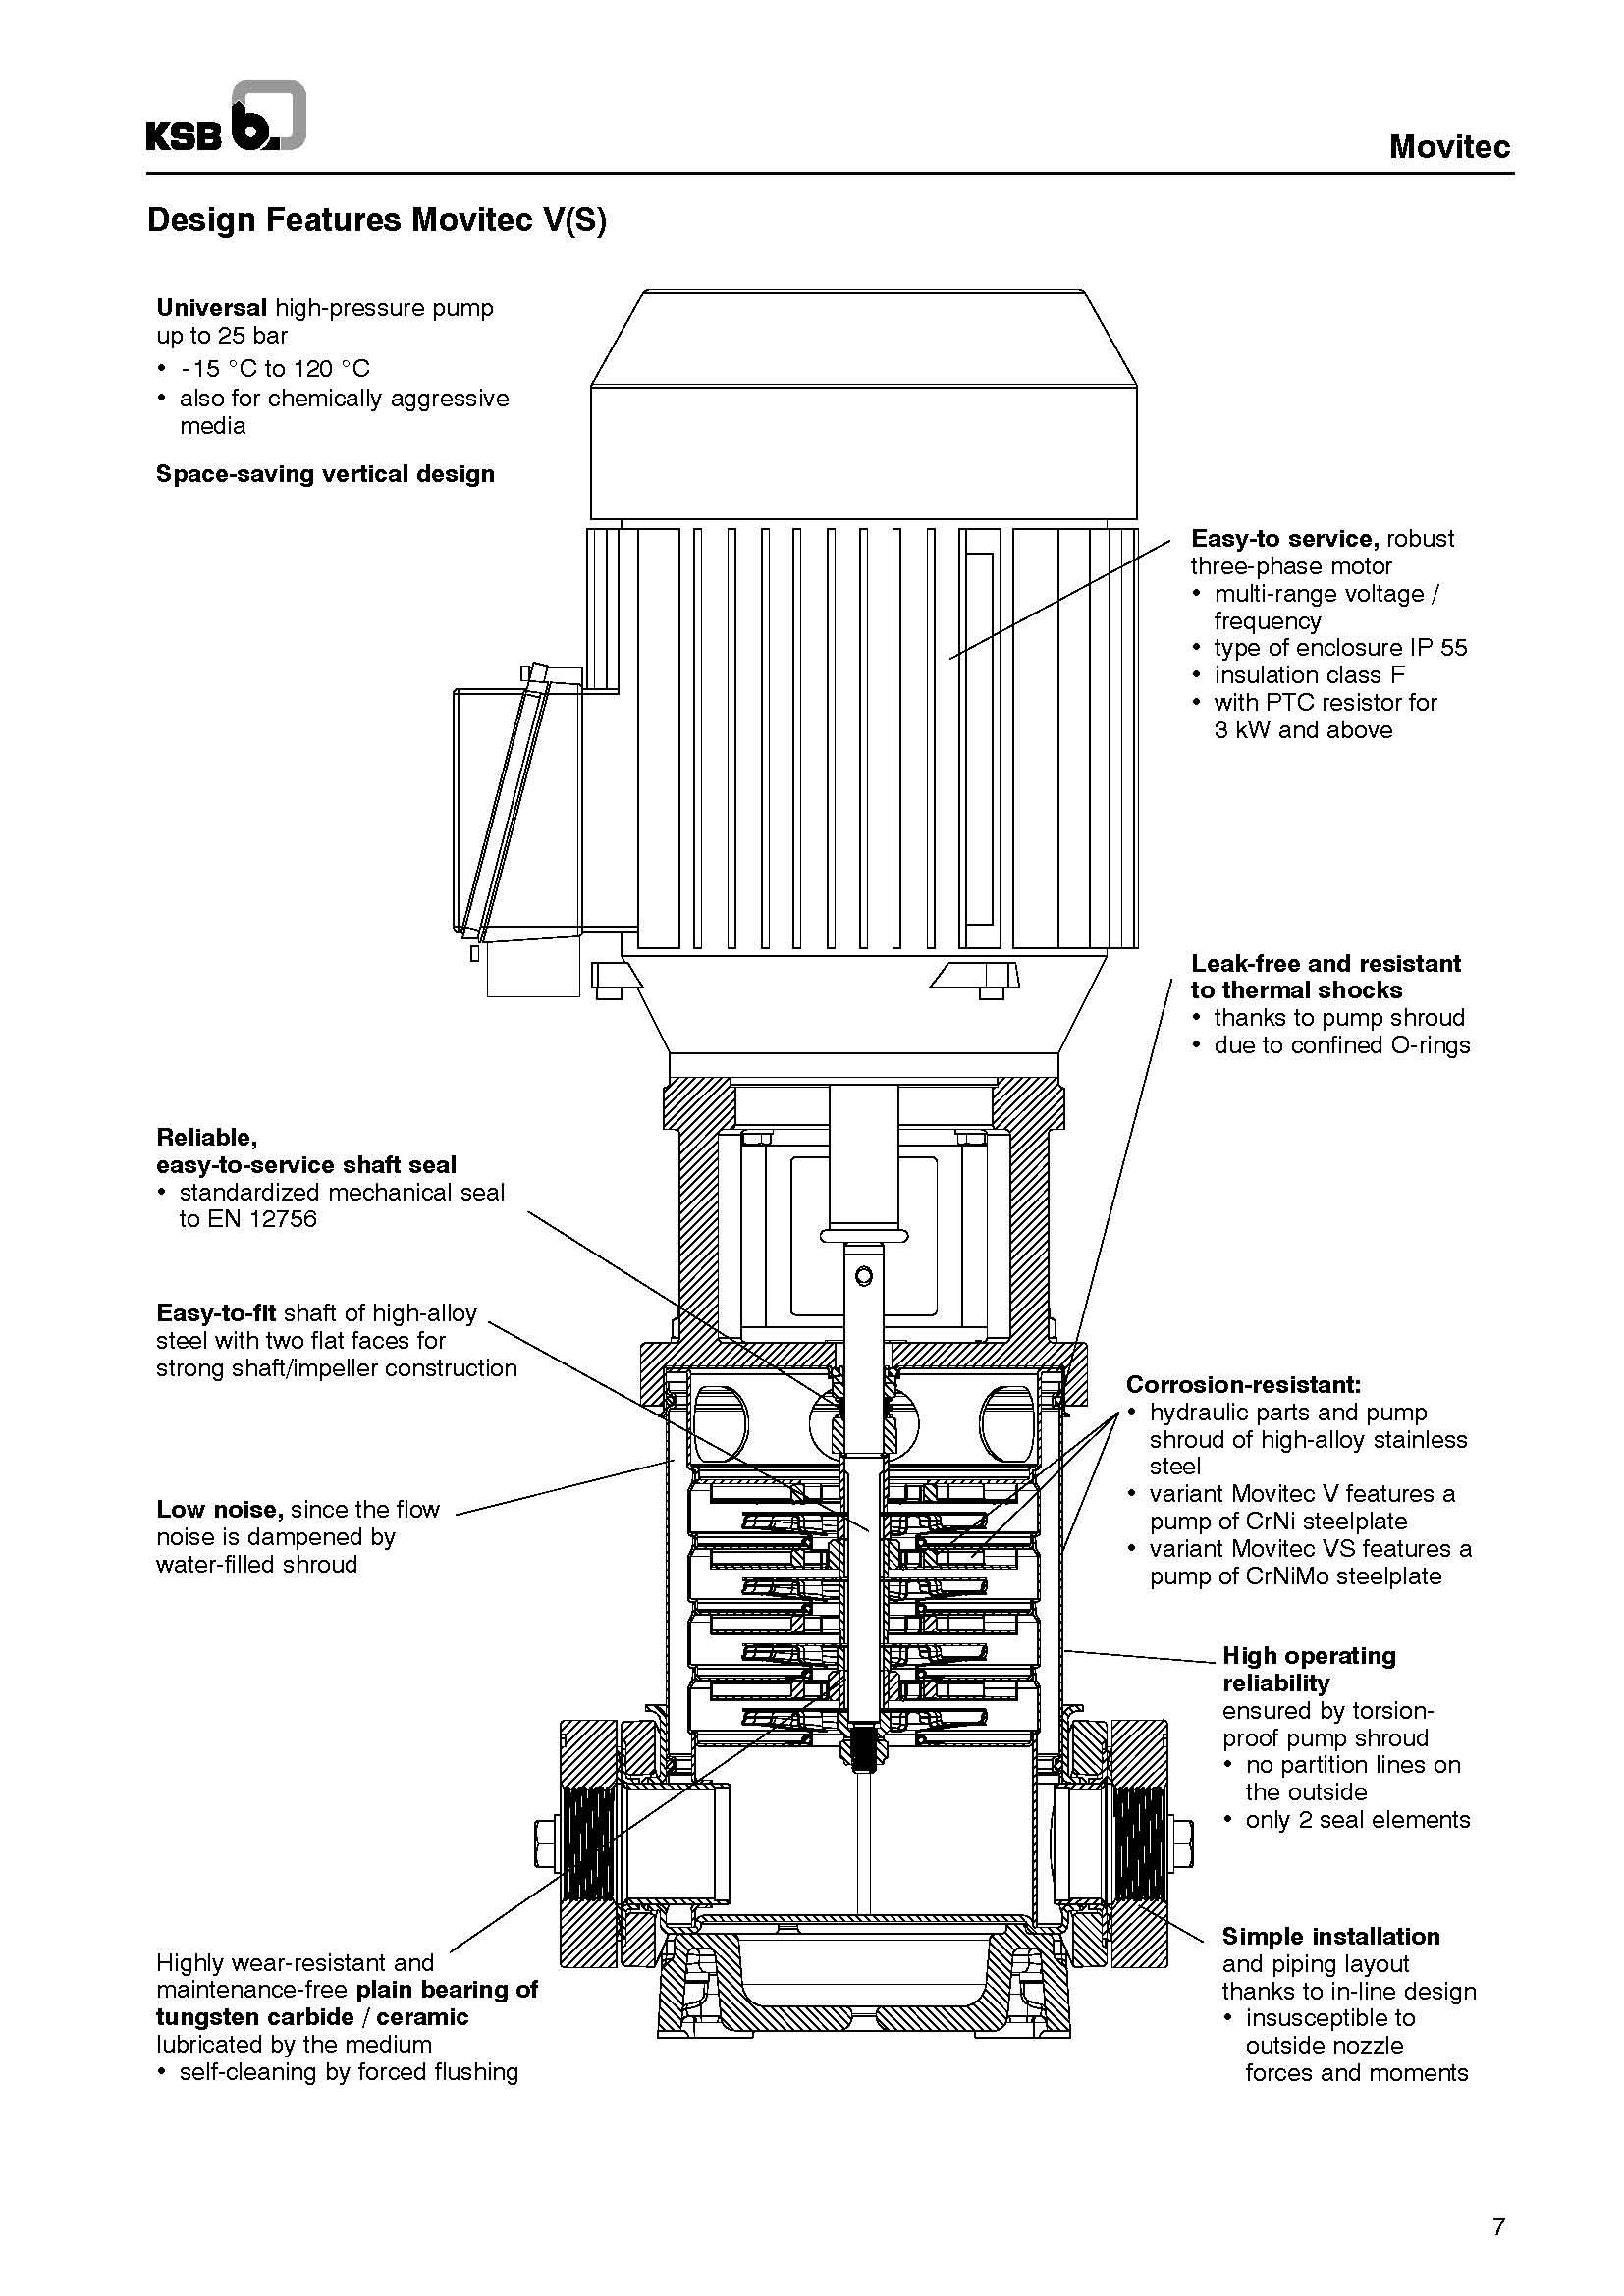 Industrial Pumps And Motor Supply Repairs Sales